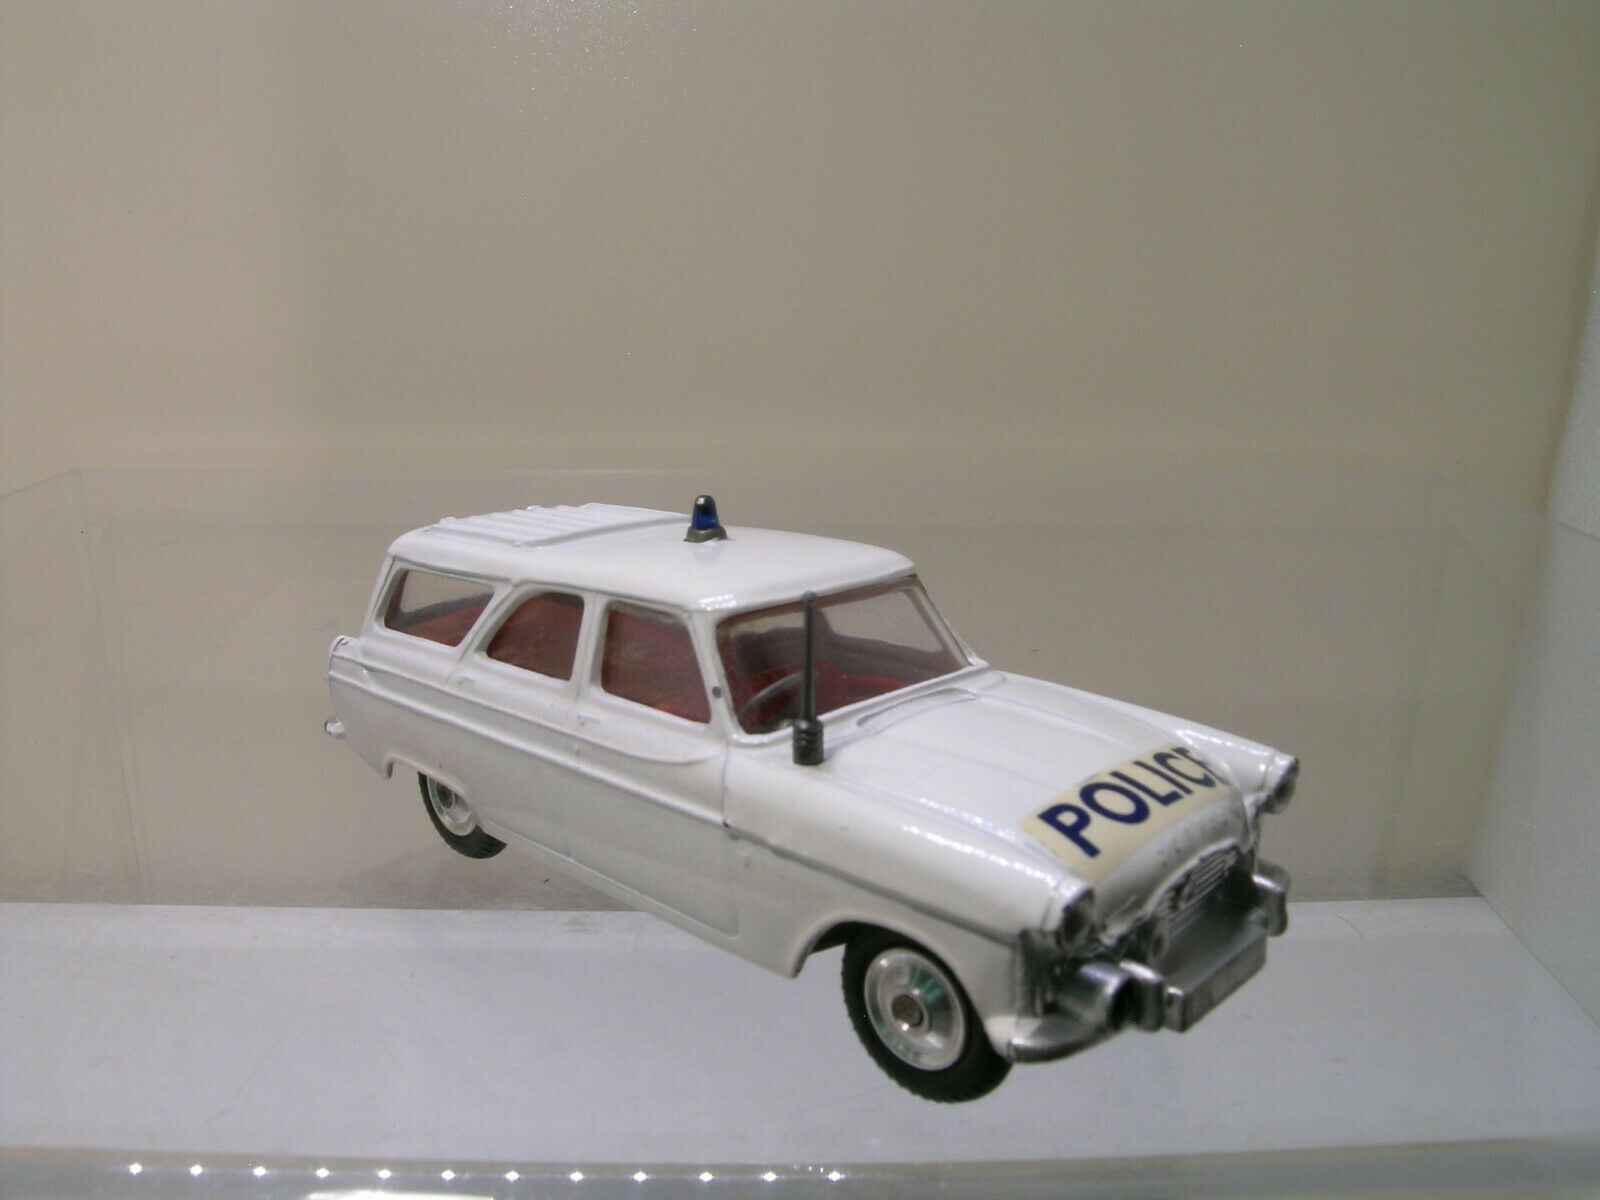 CORGI giocattoli UK No.419 FORD ZEPHYR MOTORWAY PATROL polizia NMM SCALE 1 43